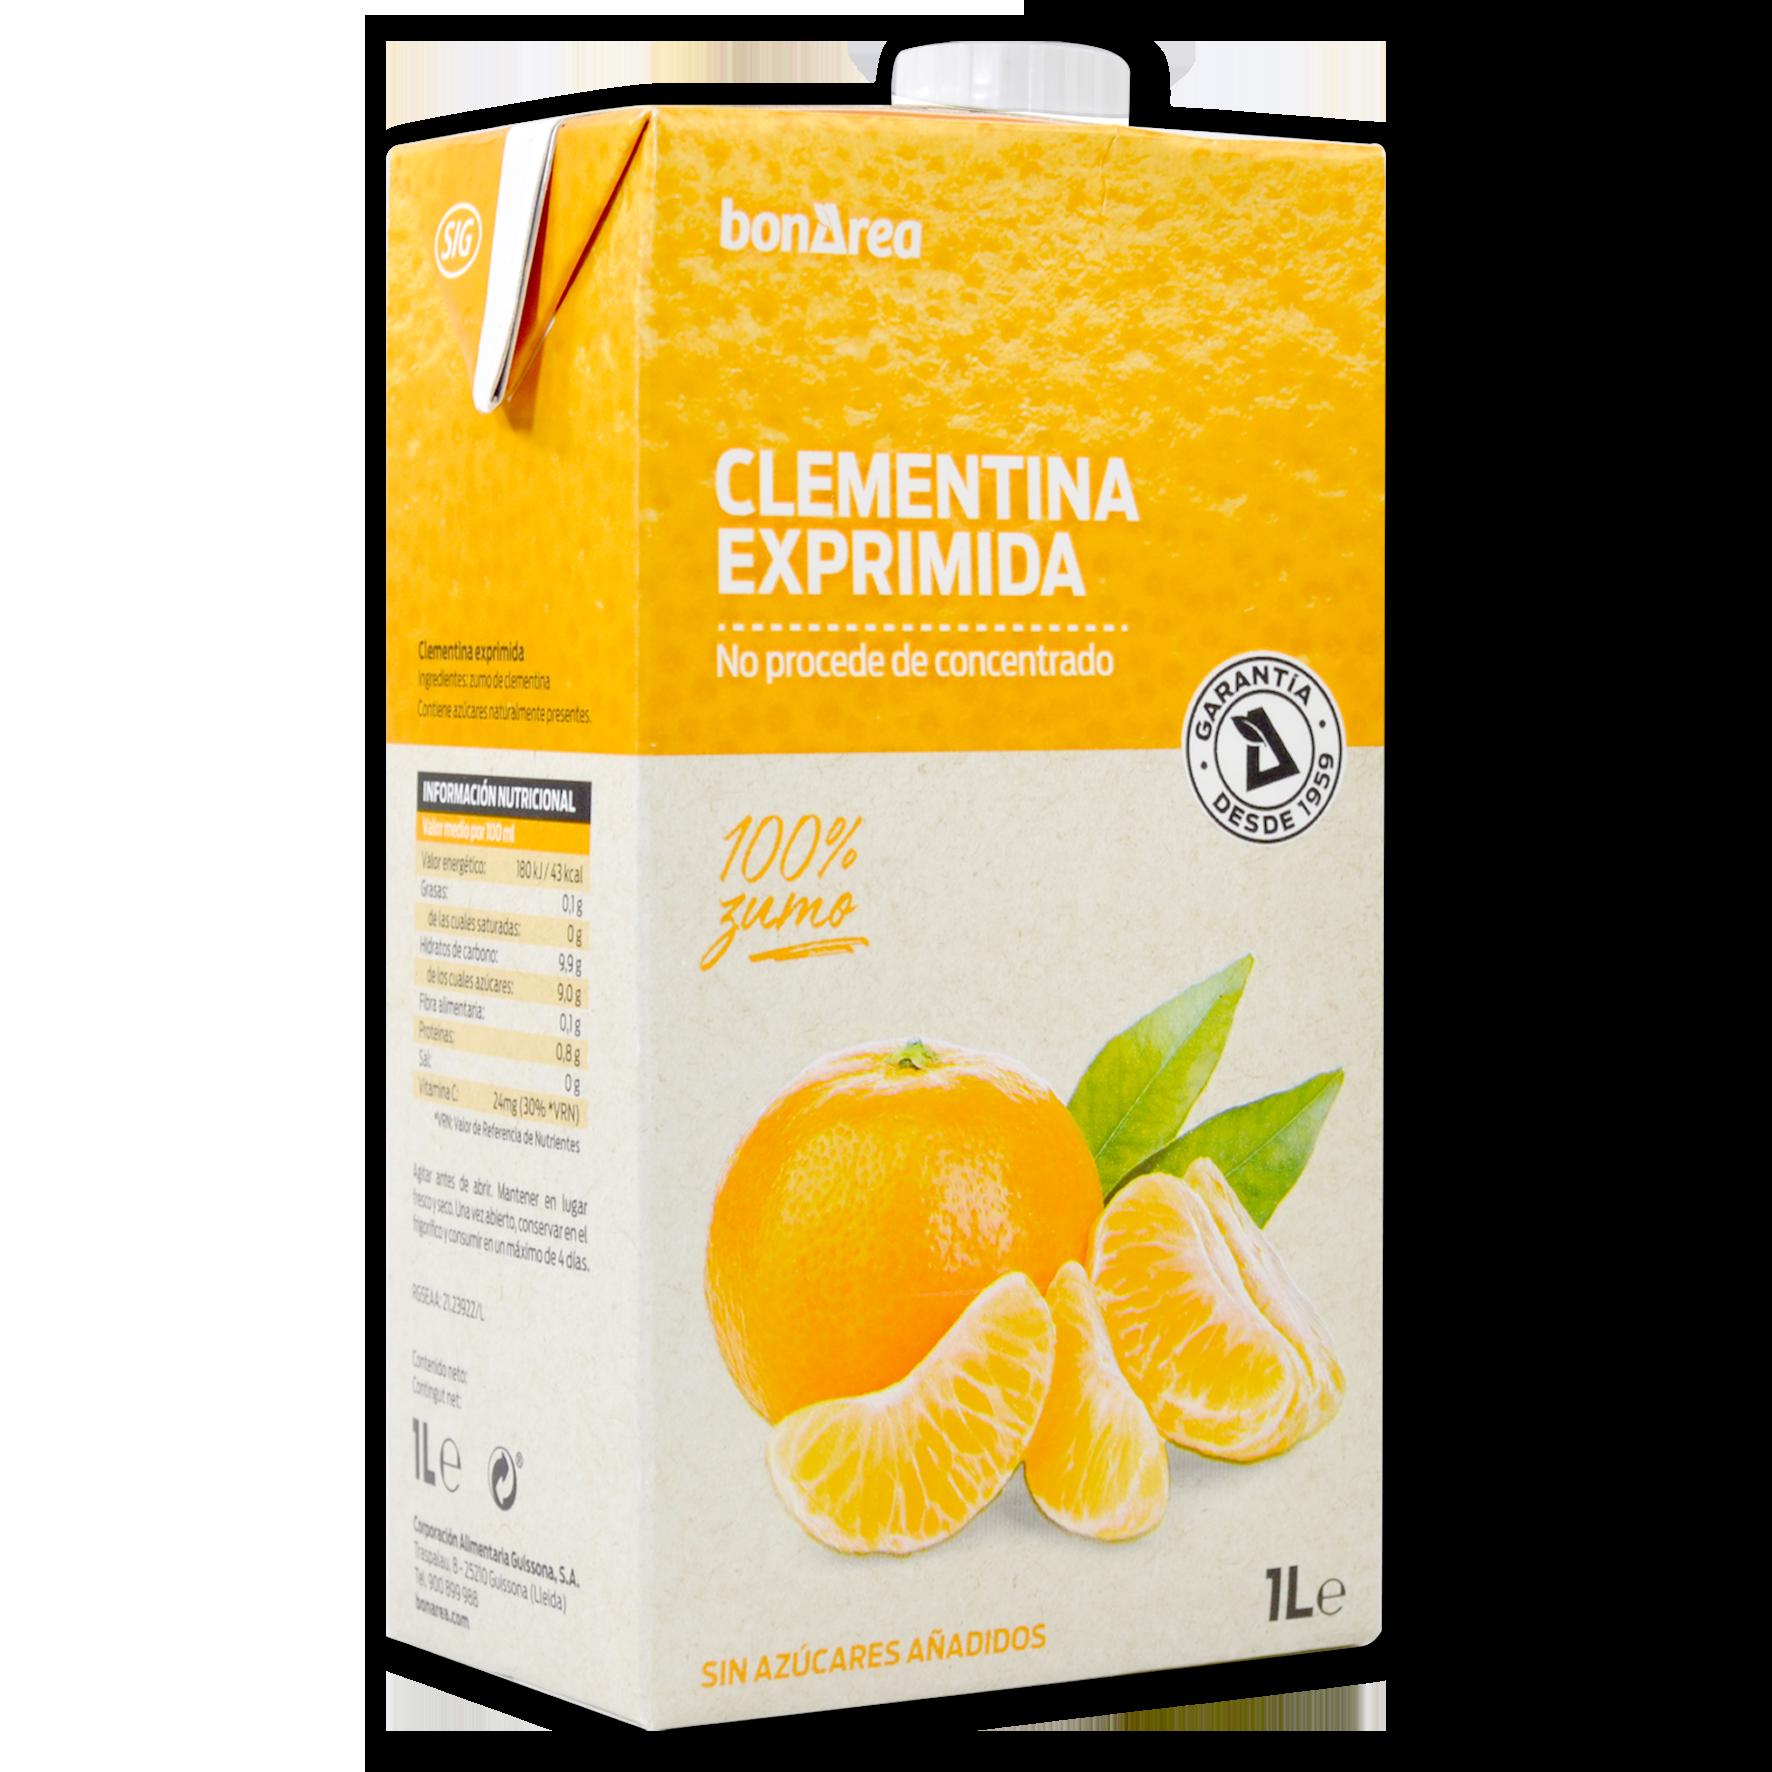 Suc de clementina espremuda